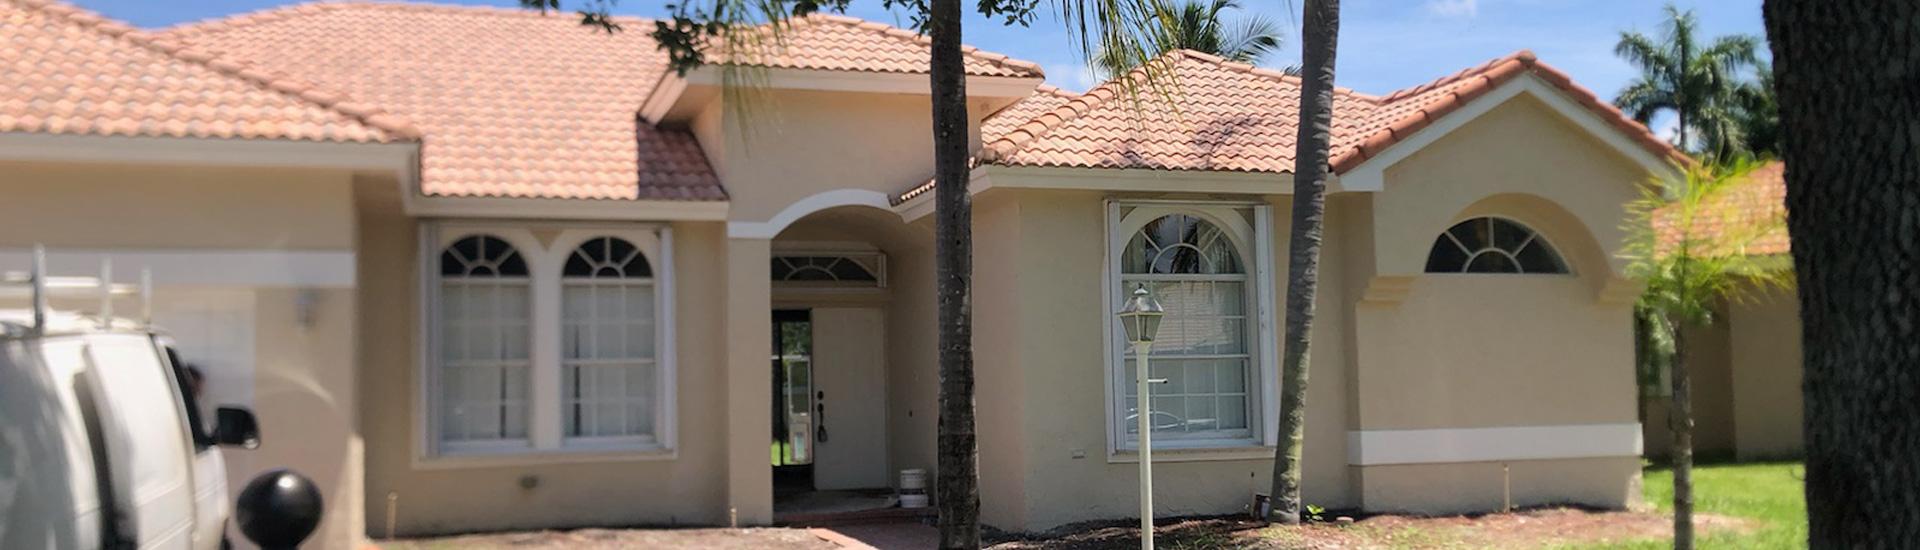 Home Remodeling in Davie, Fort Lauderdale, Hollywood, Miramar, Pembroke Pines, and Weston, FL